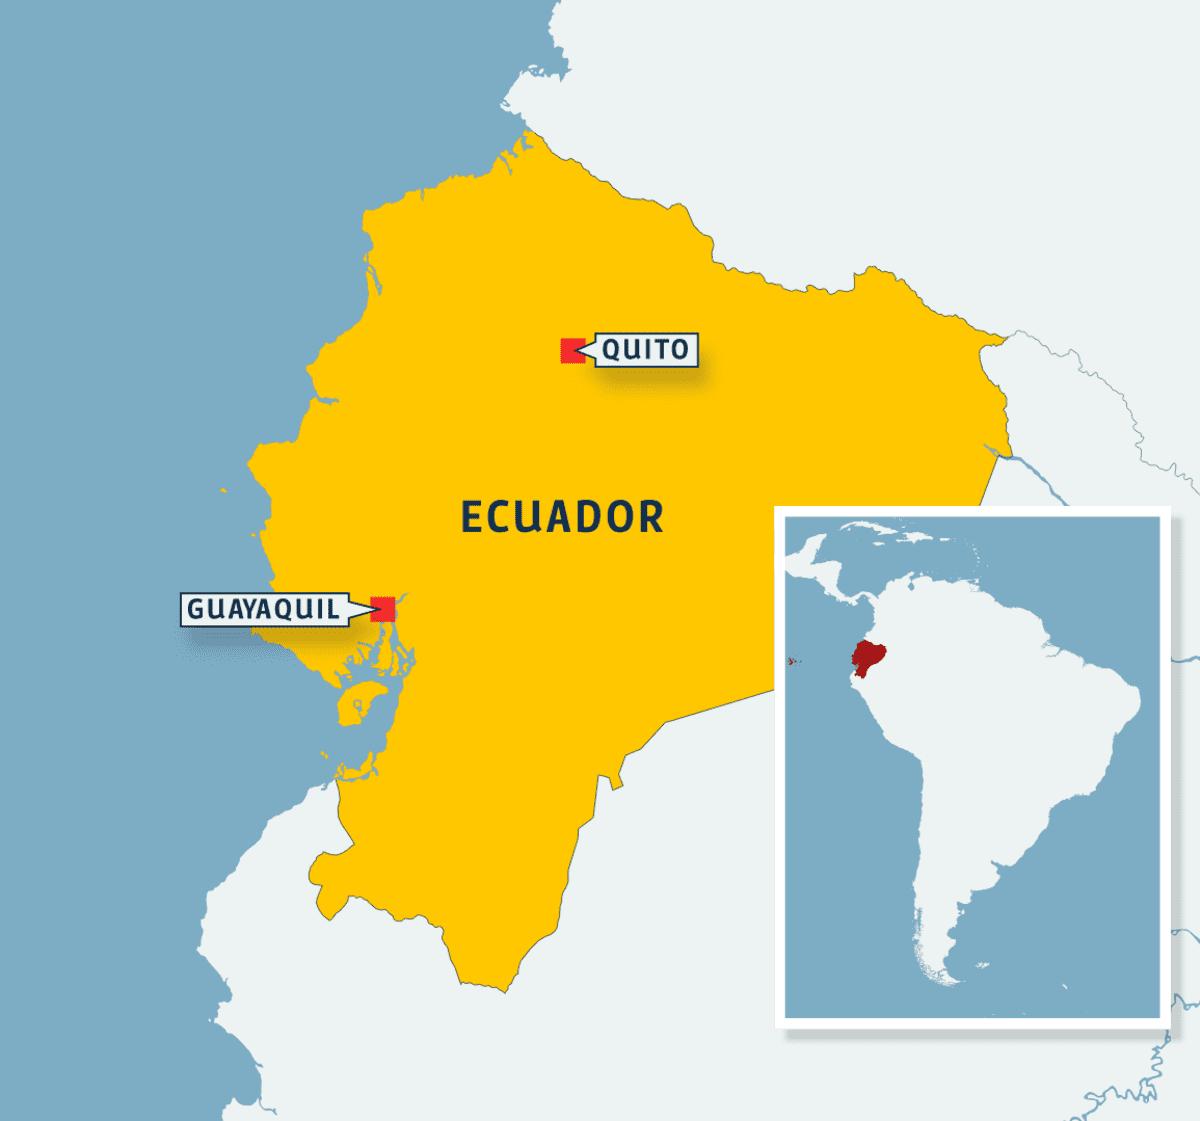 Ecuadorin kartta